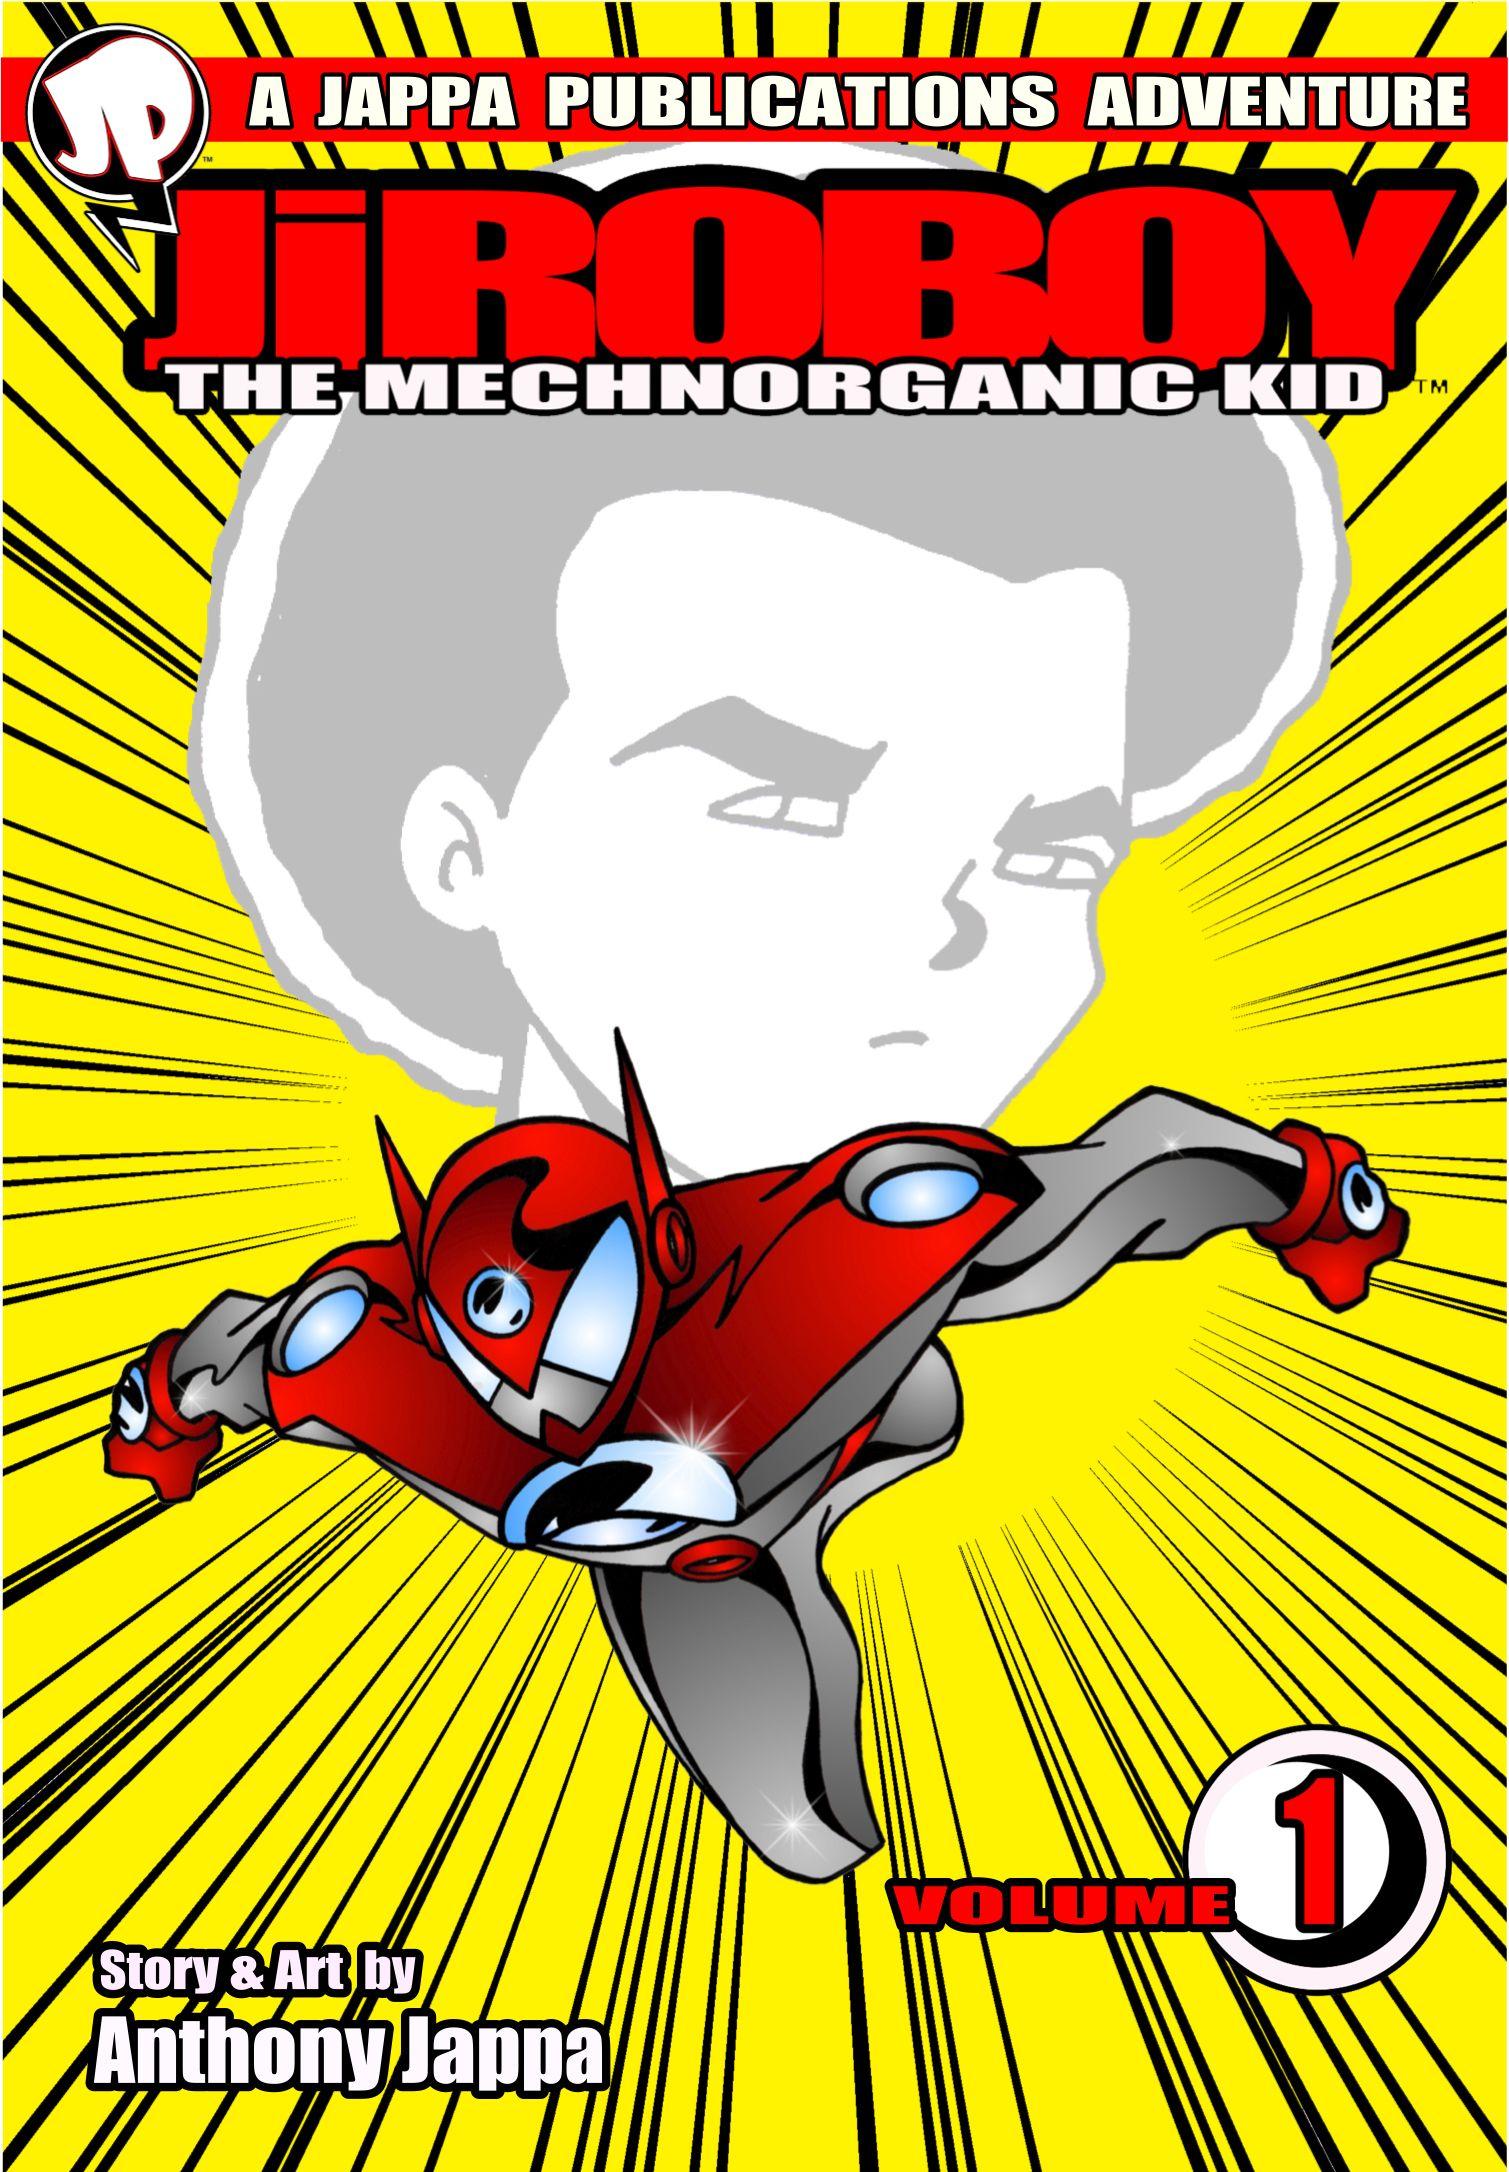 Featured Comic Book November Jiroboy The